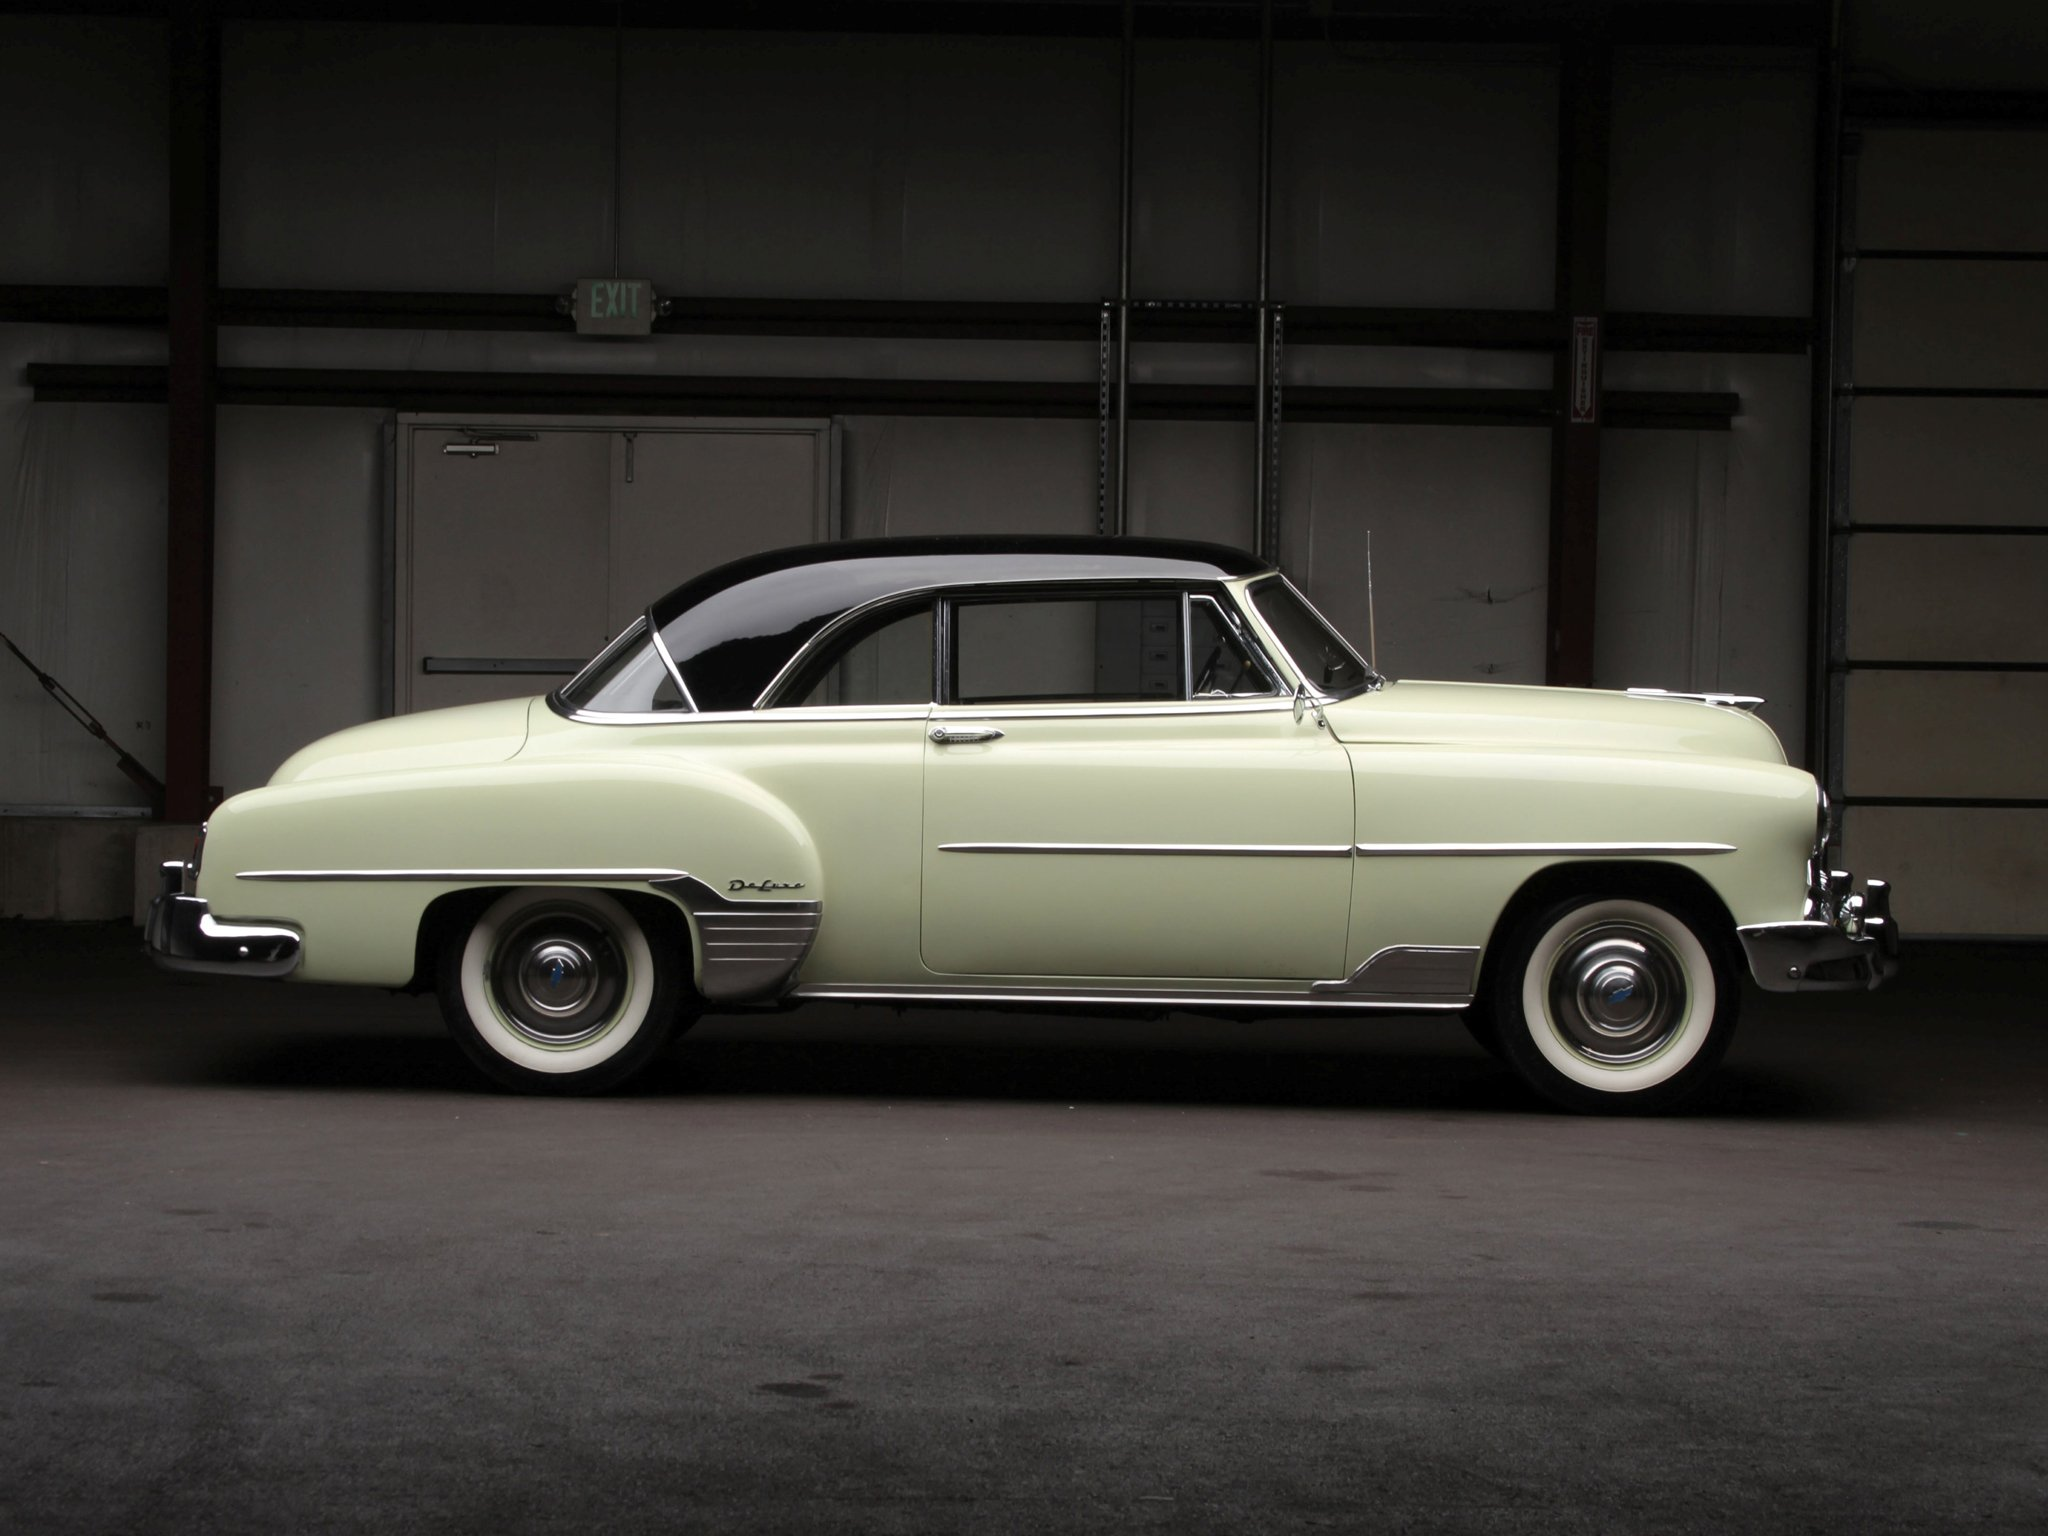 1953 Chevrolet DeLuxe 210 Sport Coupe (B-2154-1037) retro (7 ...